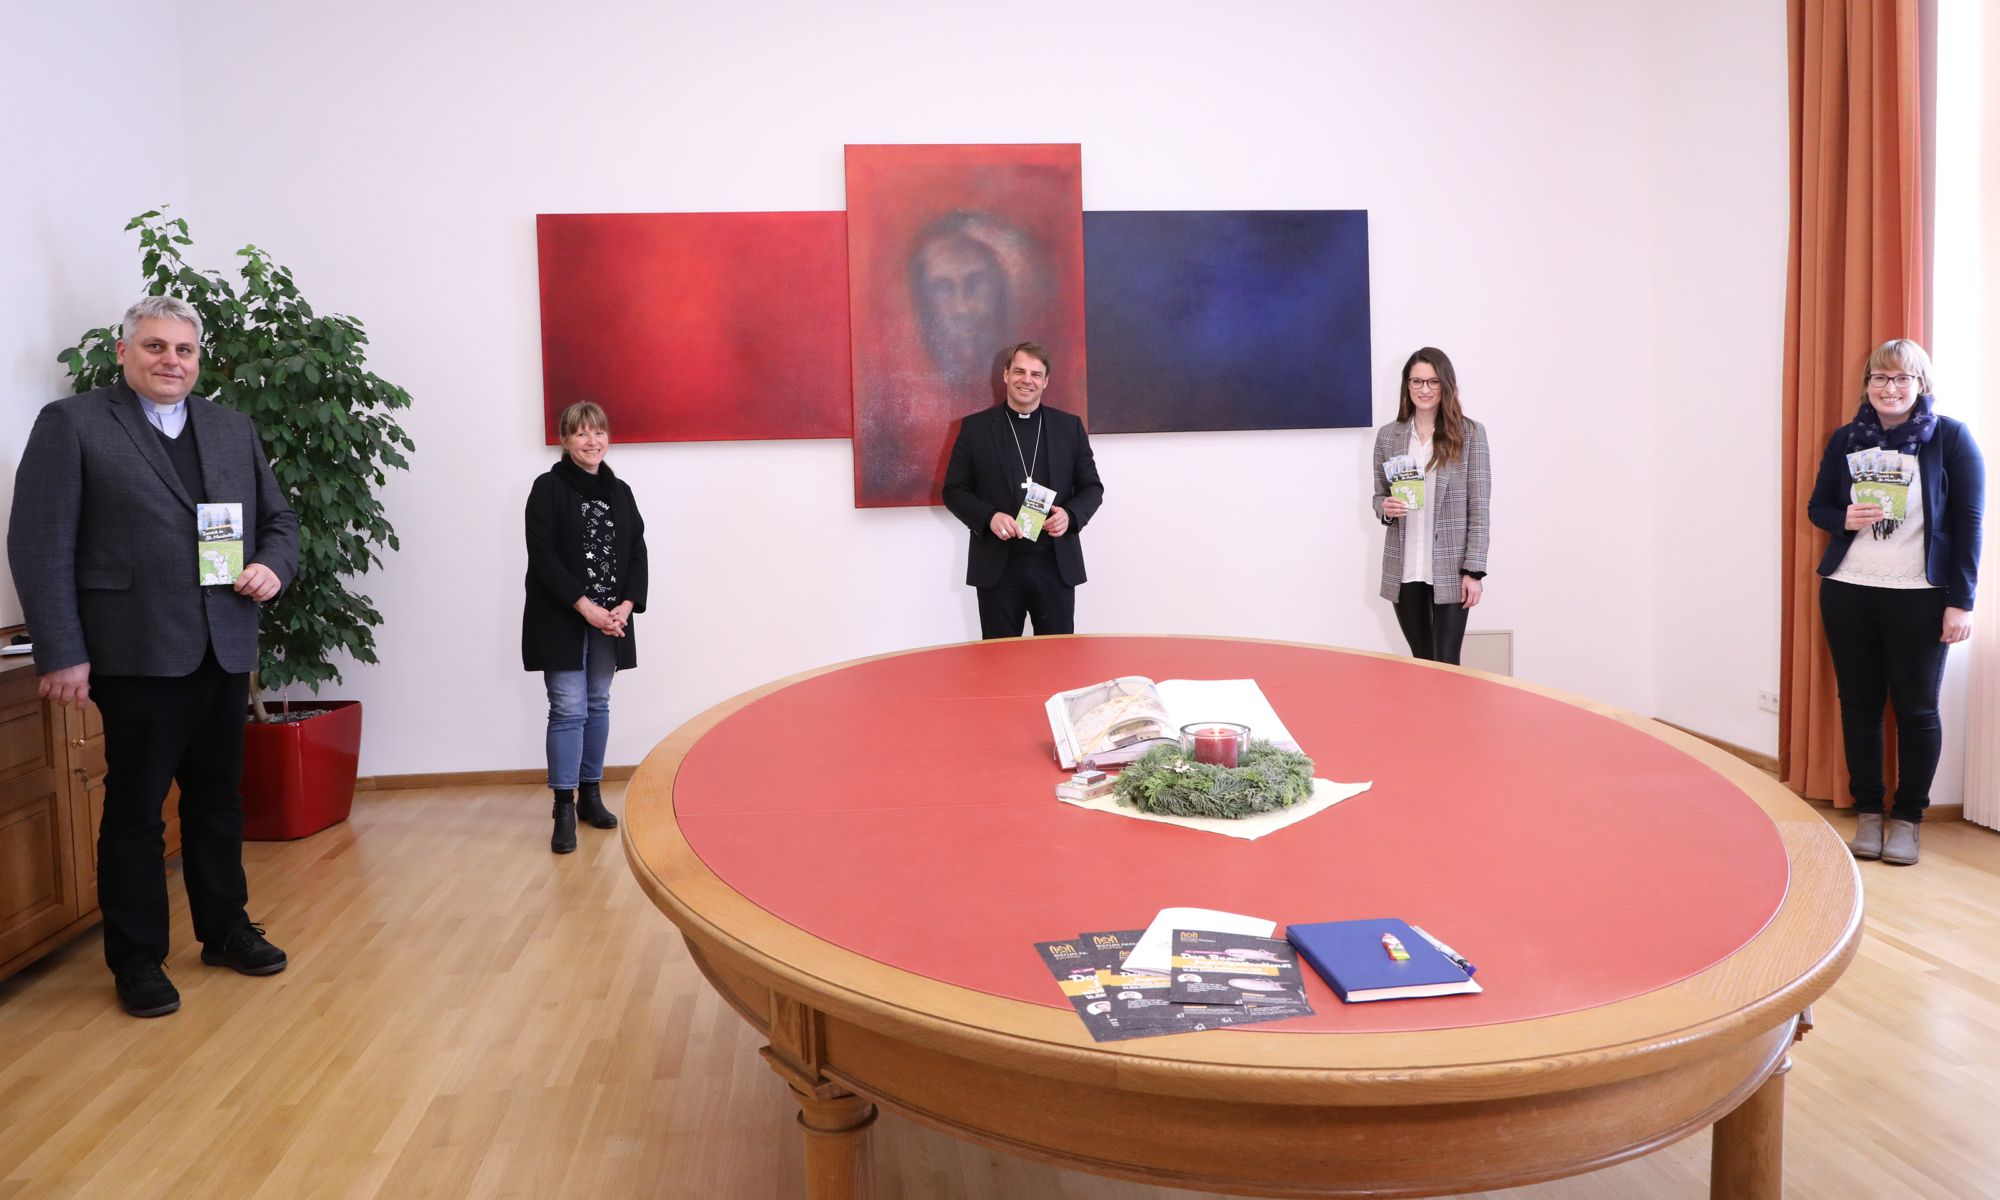 201204 Jahresprogramm Ministrantenreferat foto1